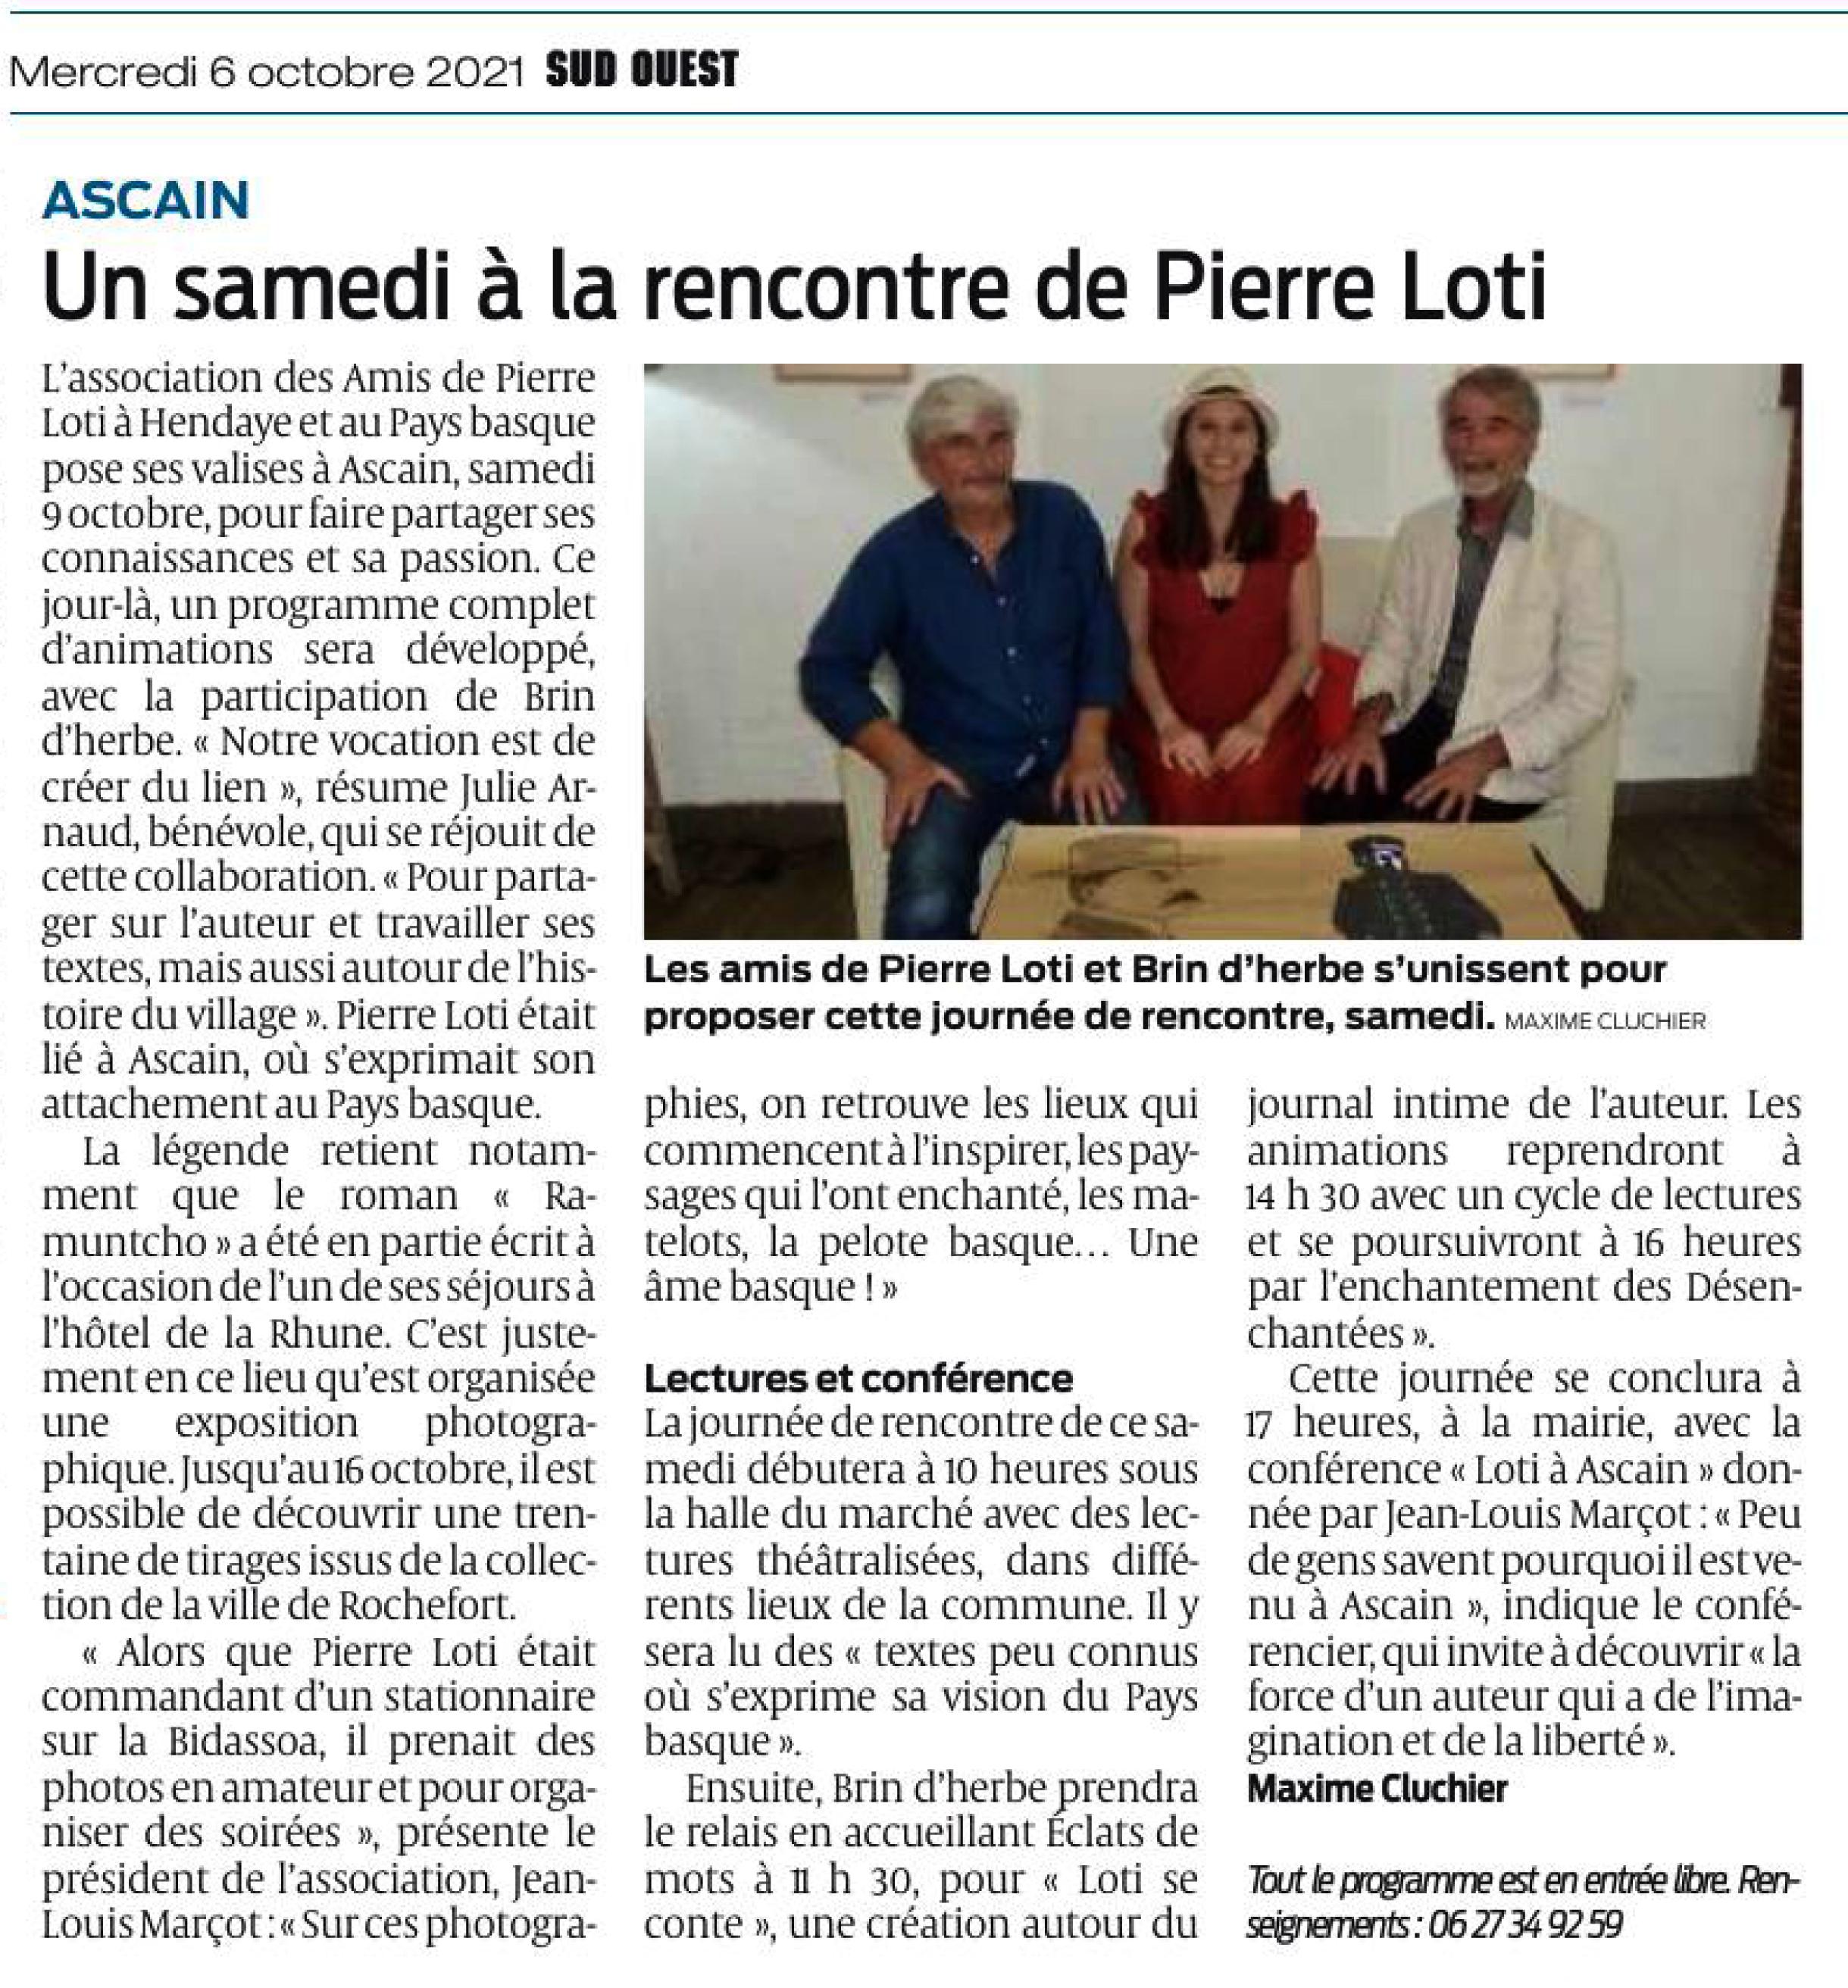 Un samedi à la rencontre de Pierre Loti-6-10-2021